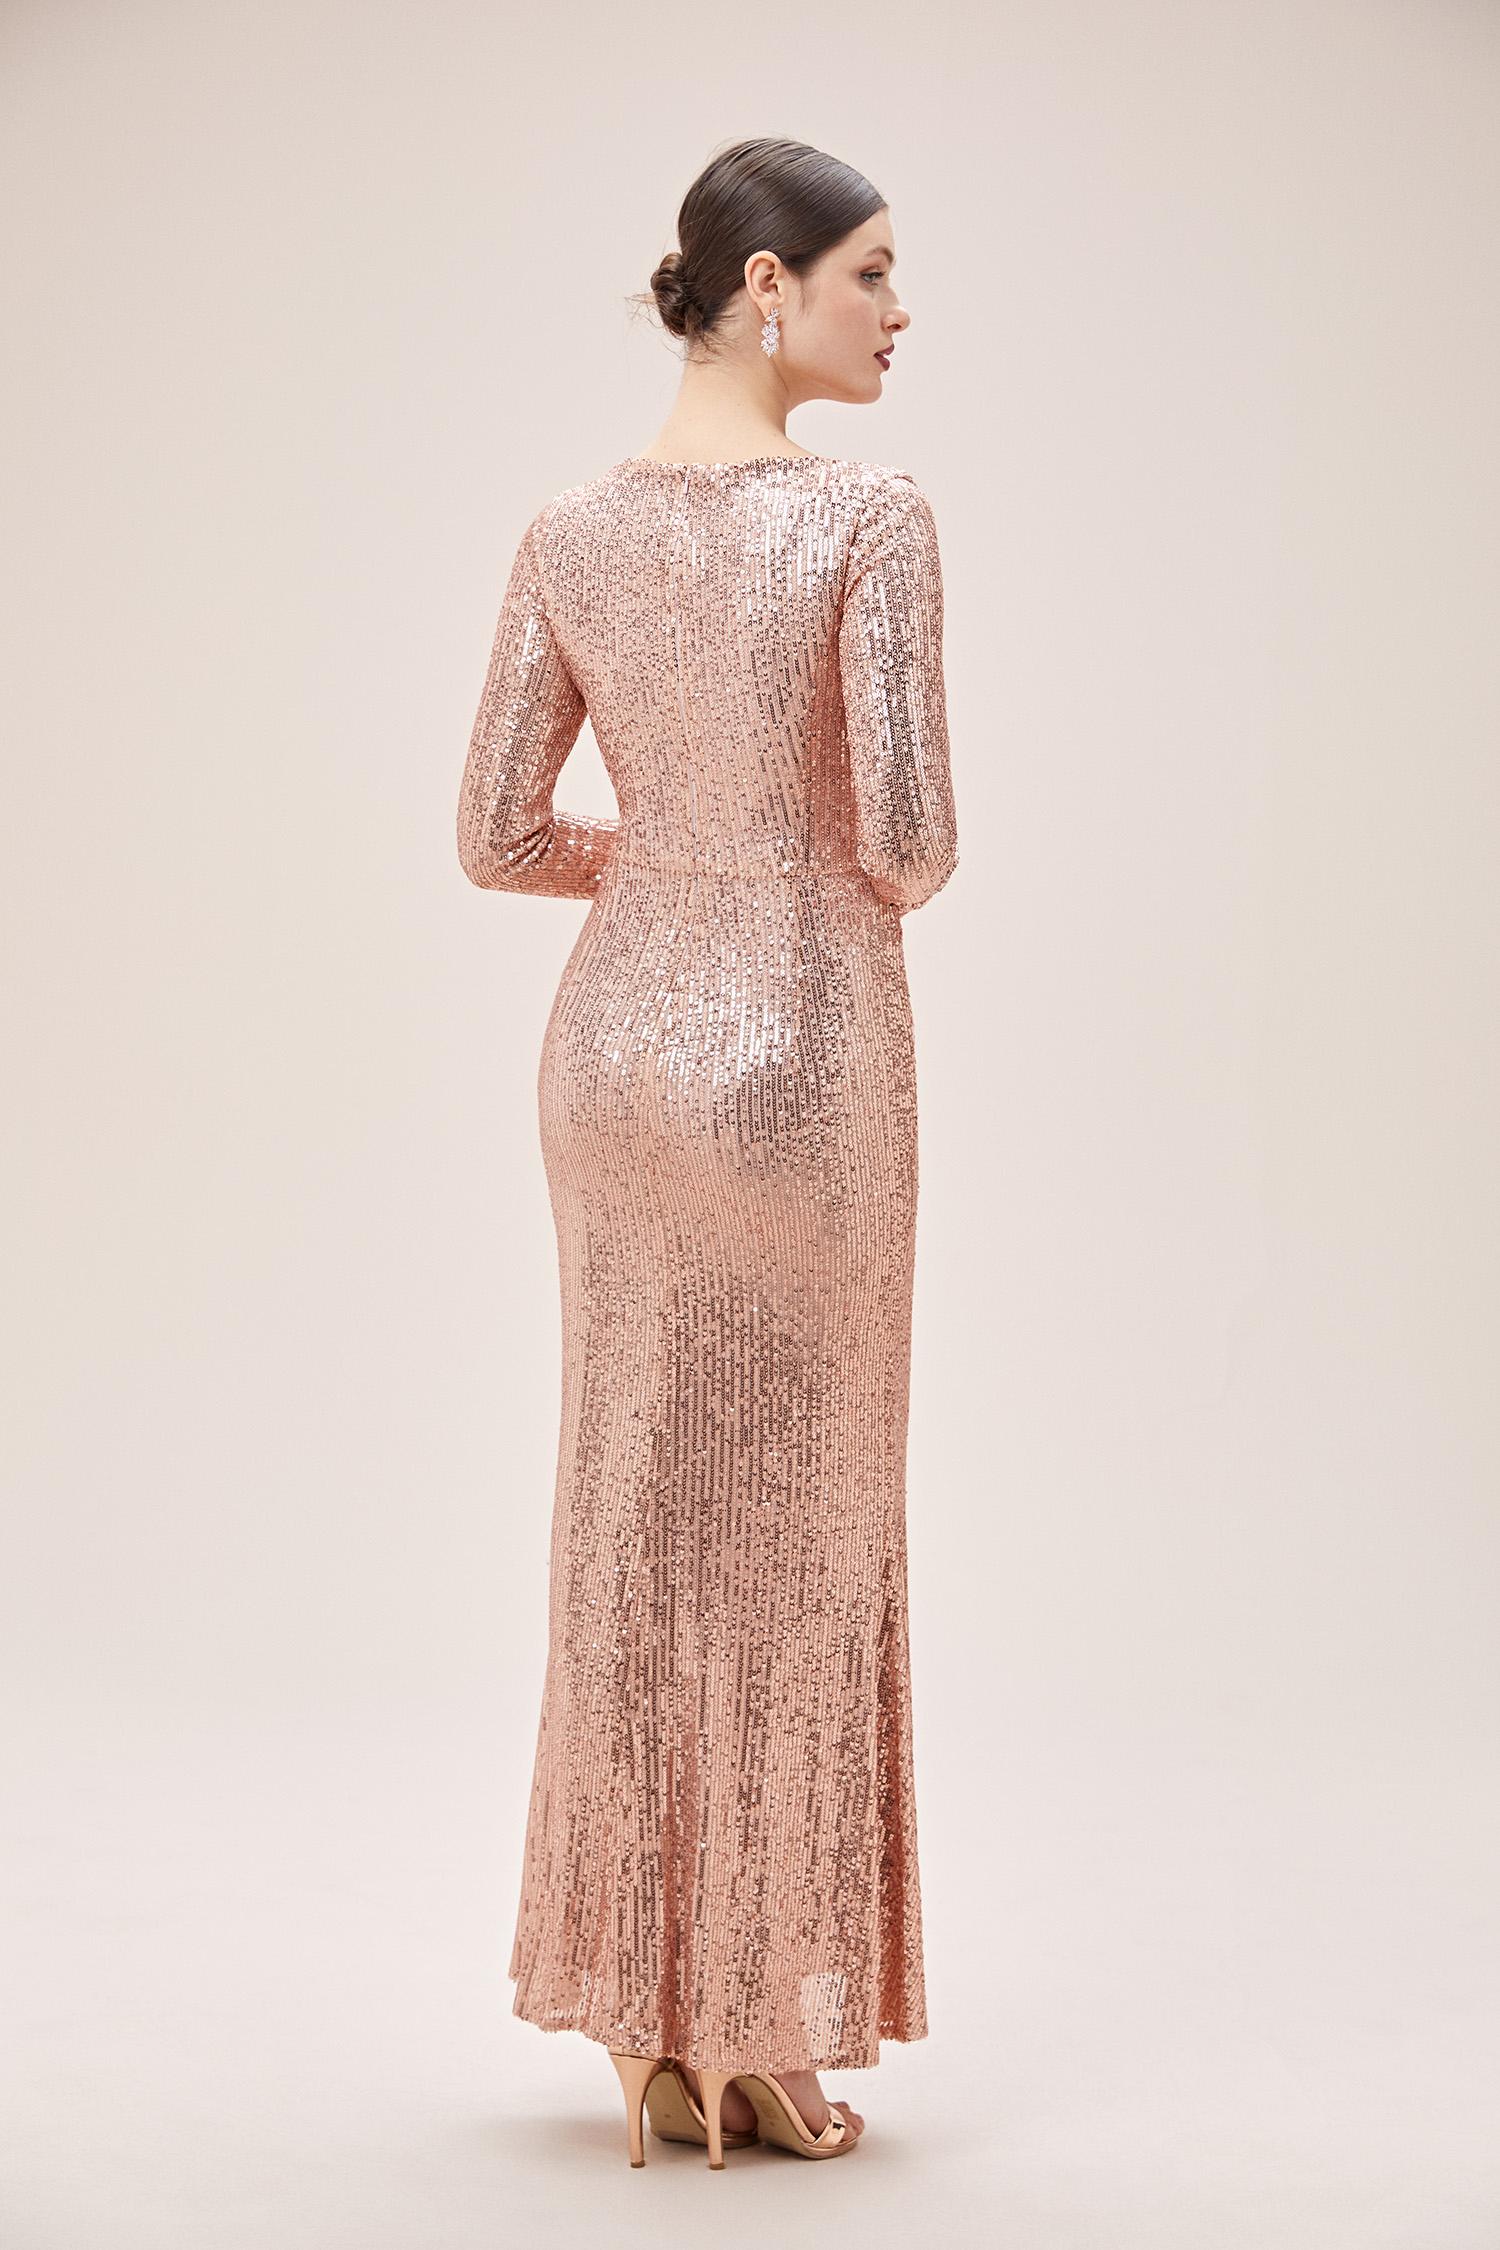 Rose Gold V Yaka Uzun Kol Payetli Uzun Abiye Elbise - Thumbnail